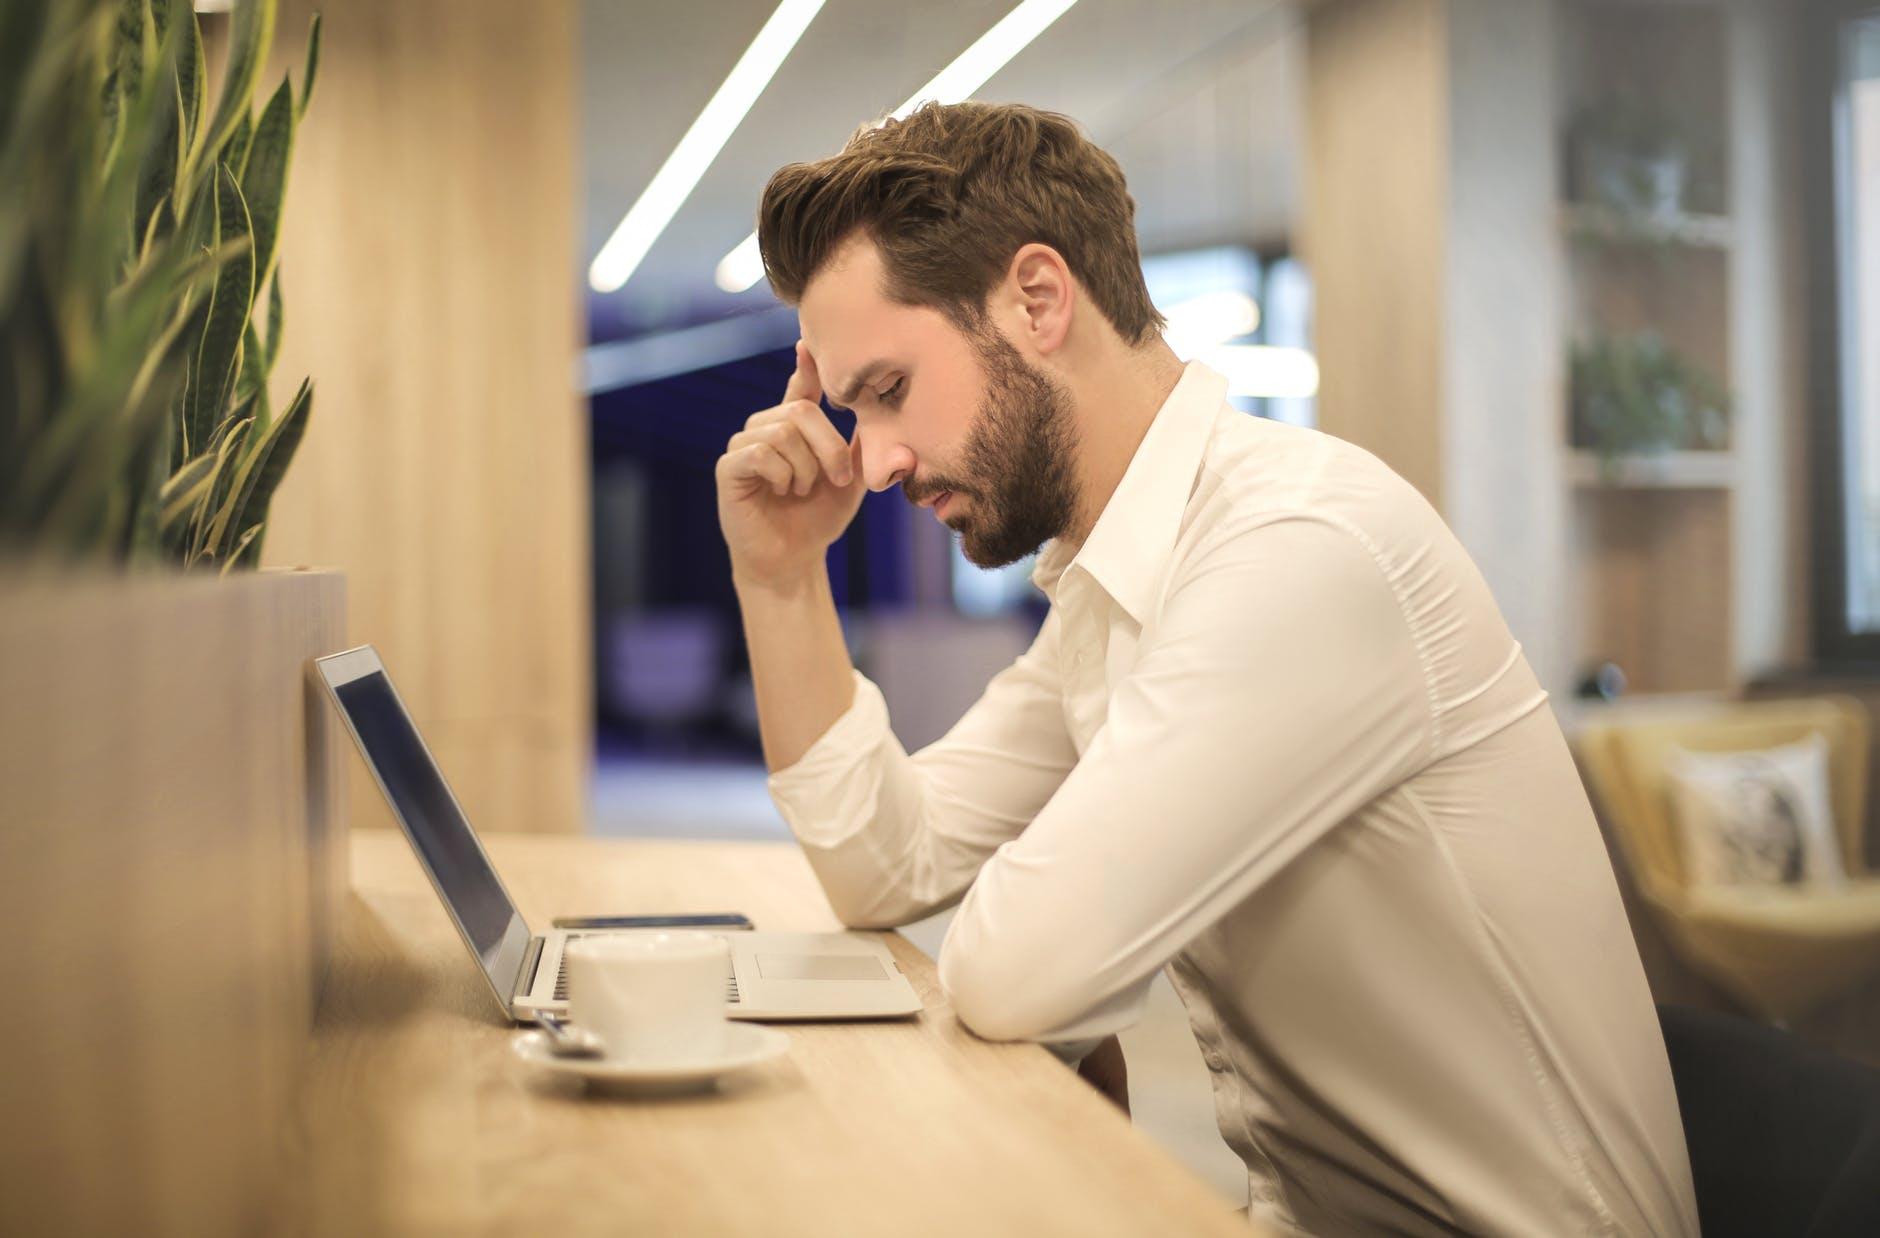 Expert Resume Help: Resume Writing Tips